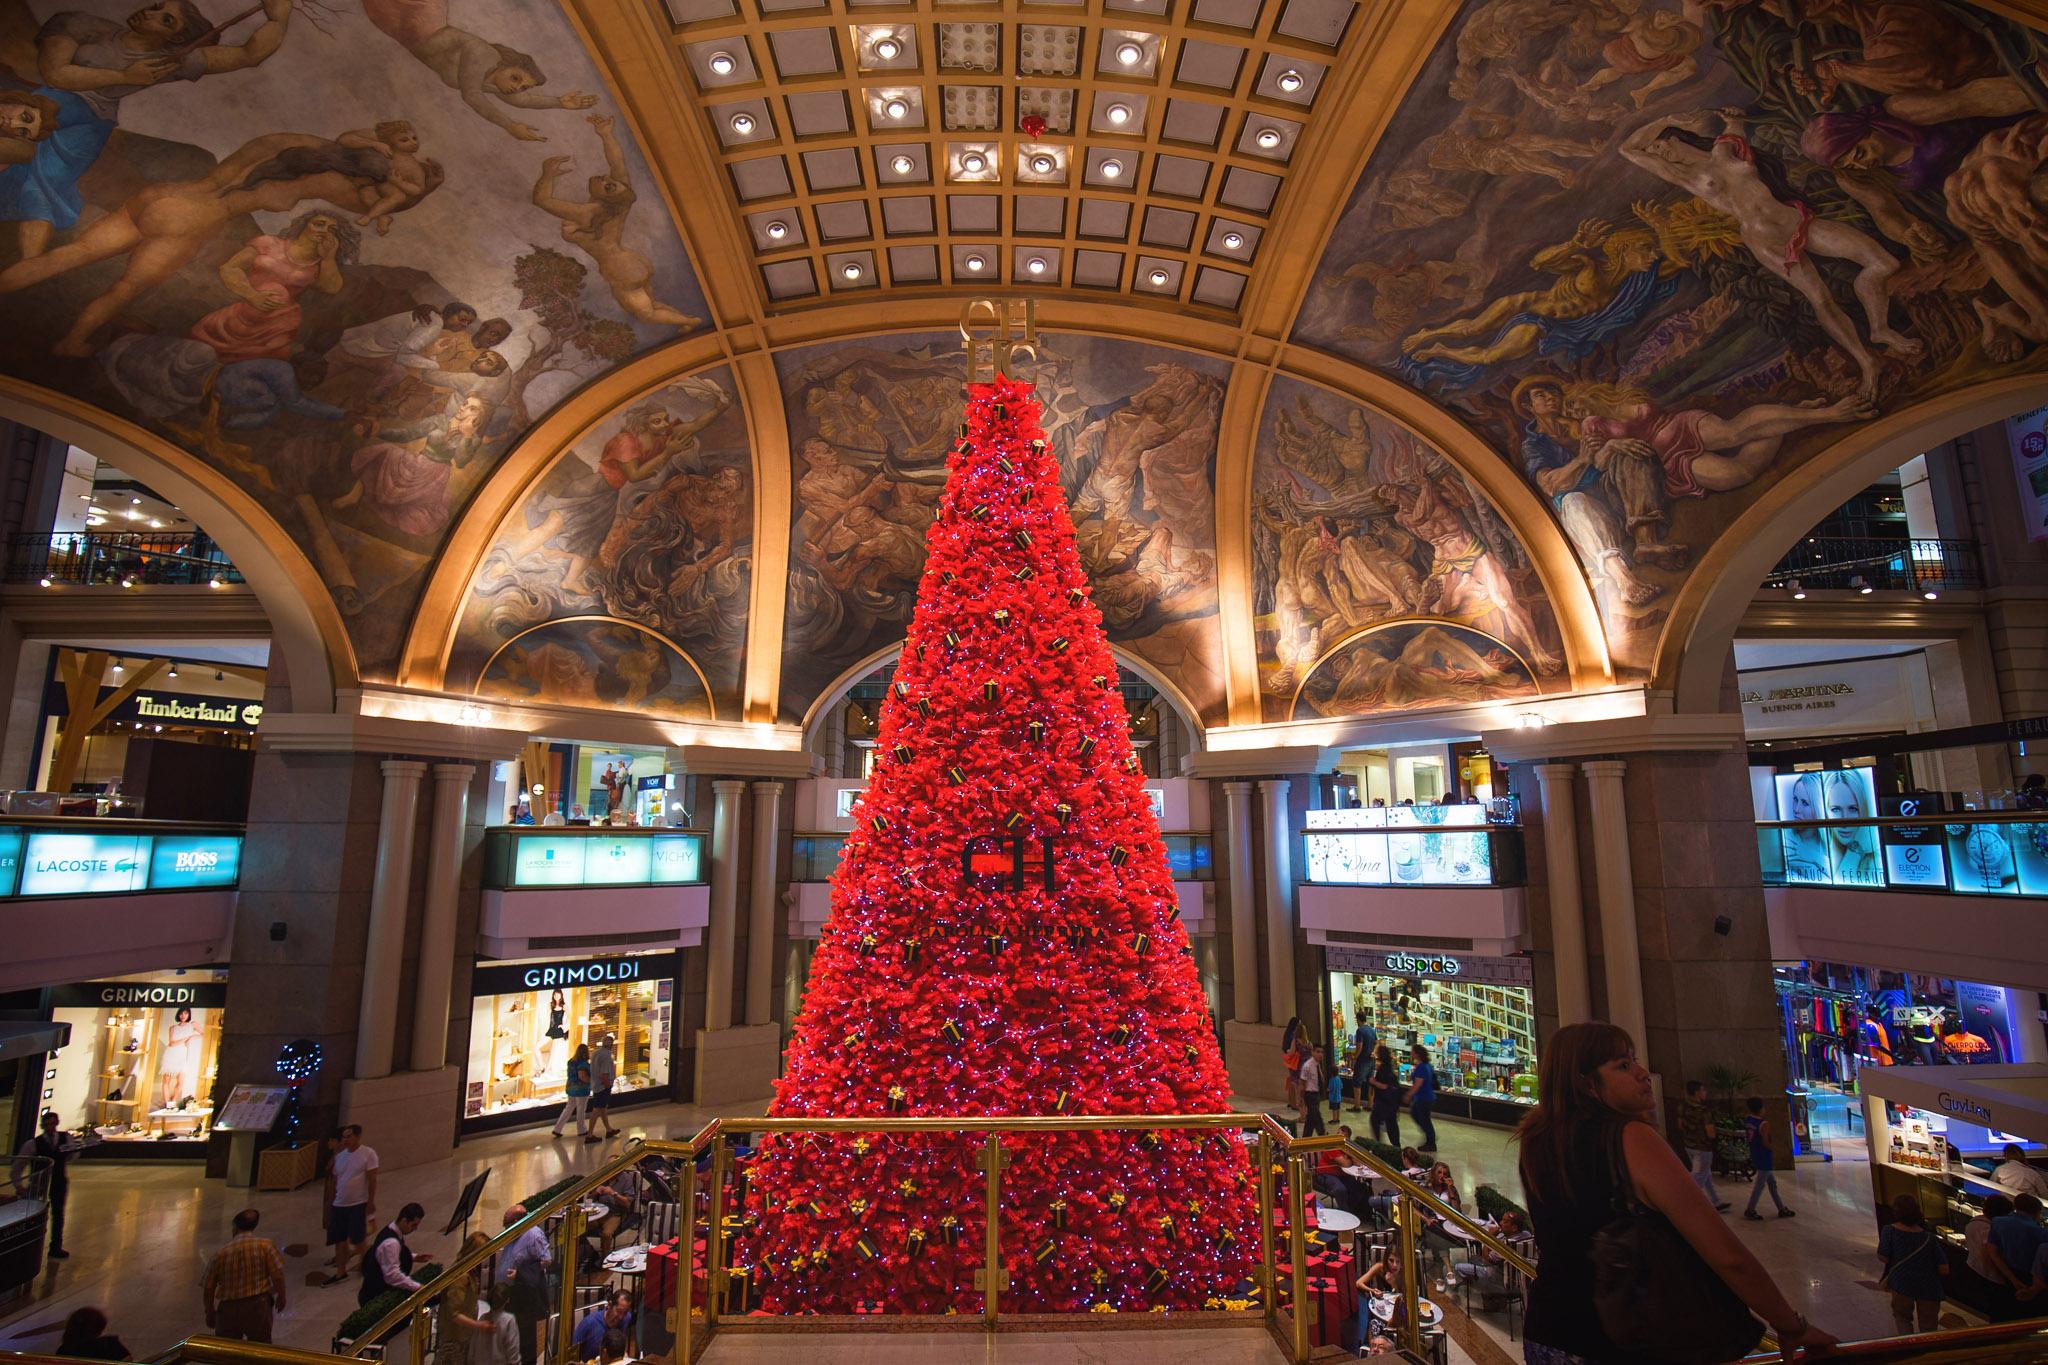 Argentina-Buenos-Aires-Galeria-Pacifico-shopping-mall-red-Christmas-tree-Carolina-Herrera